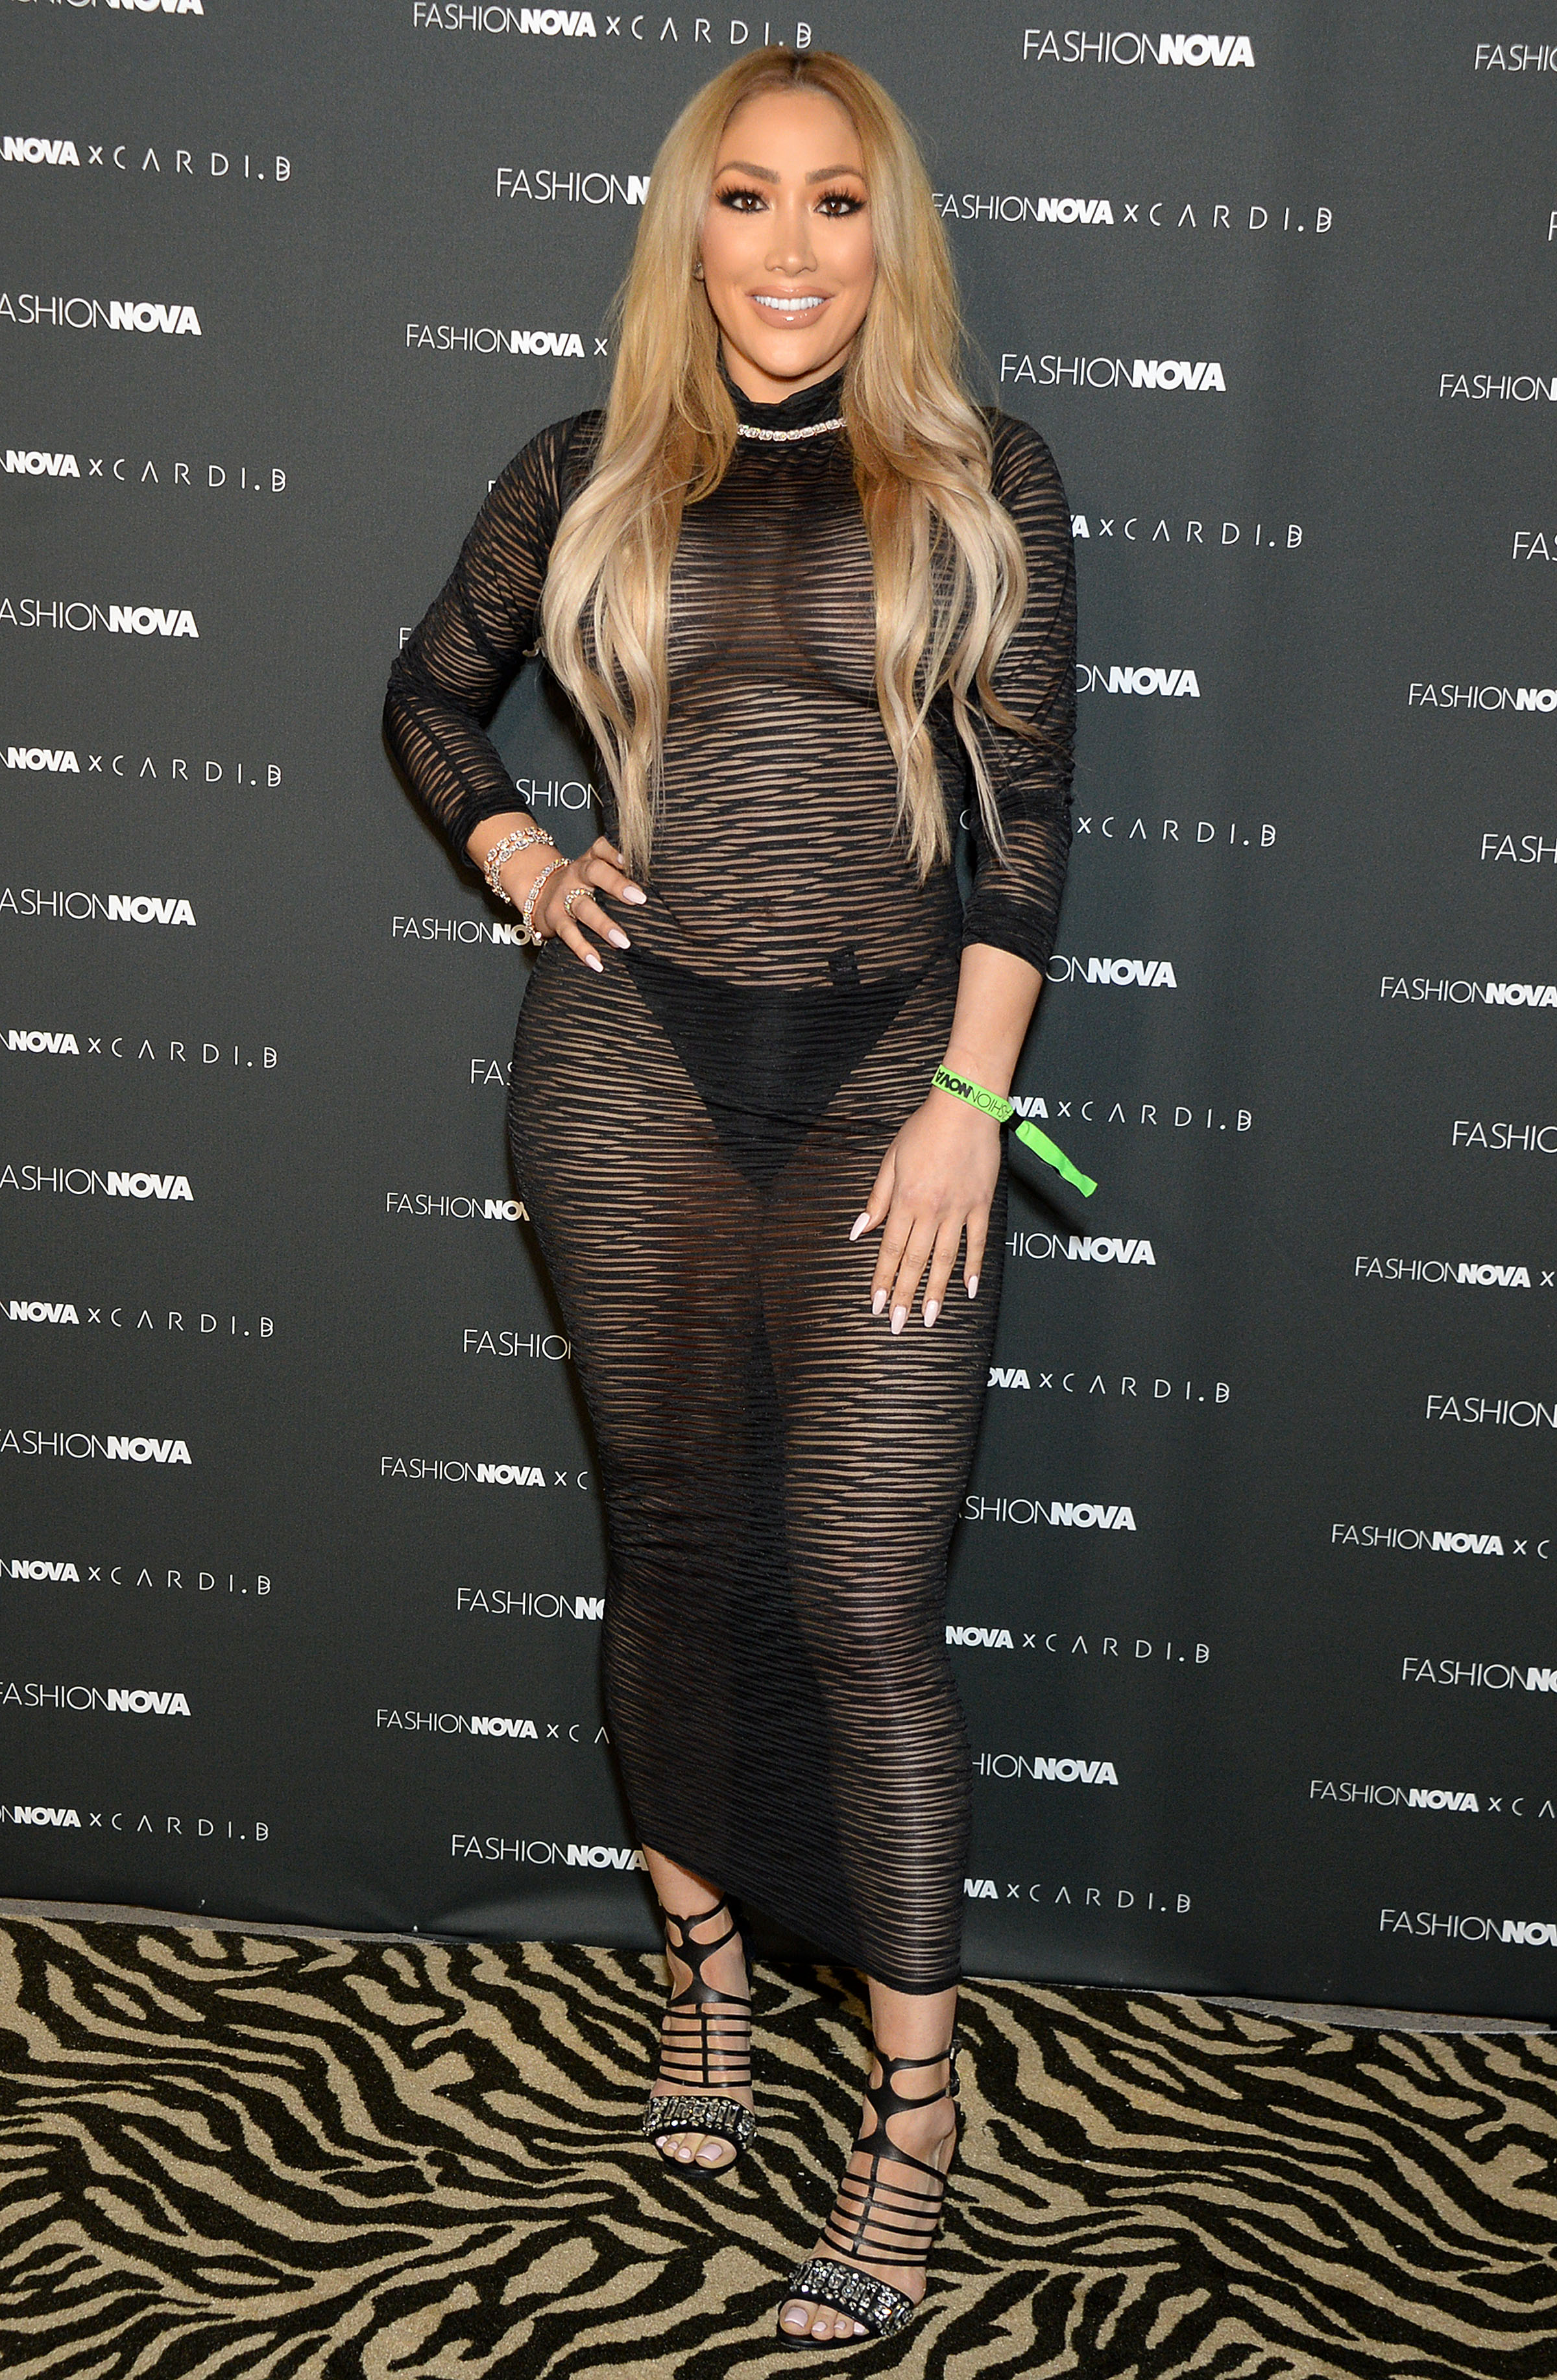 Nikki Baby The Fashion Nova x Cardi B Collection Launch Event